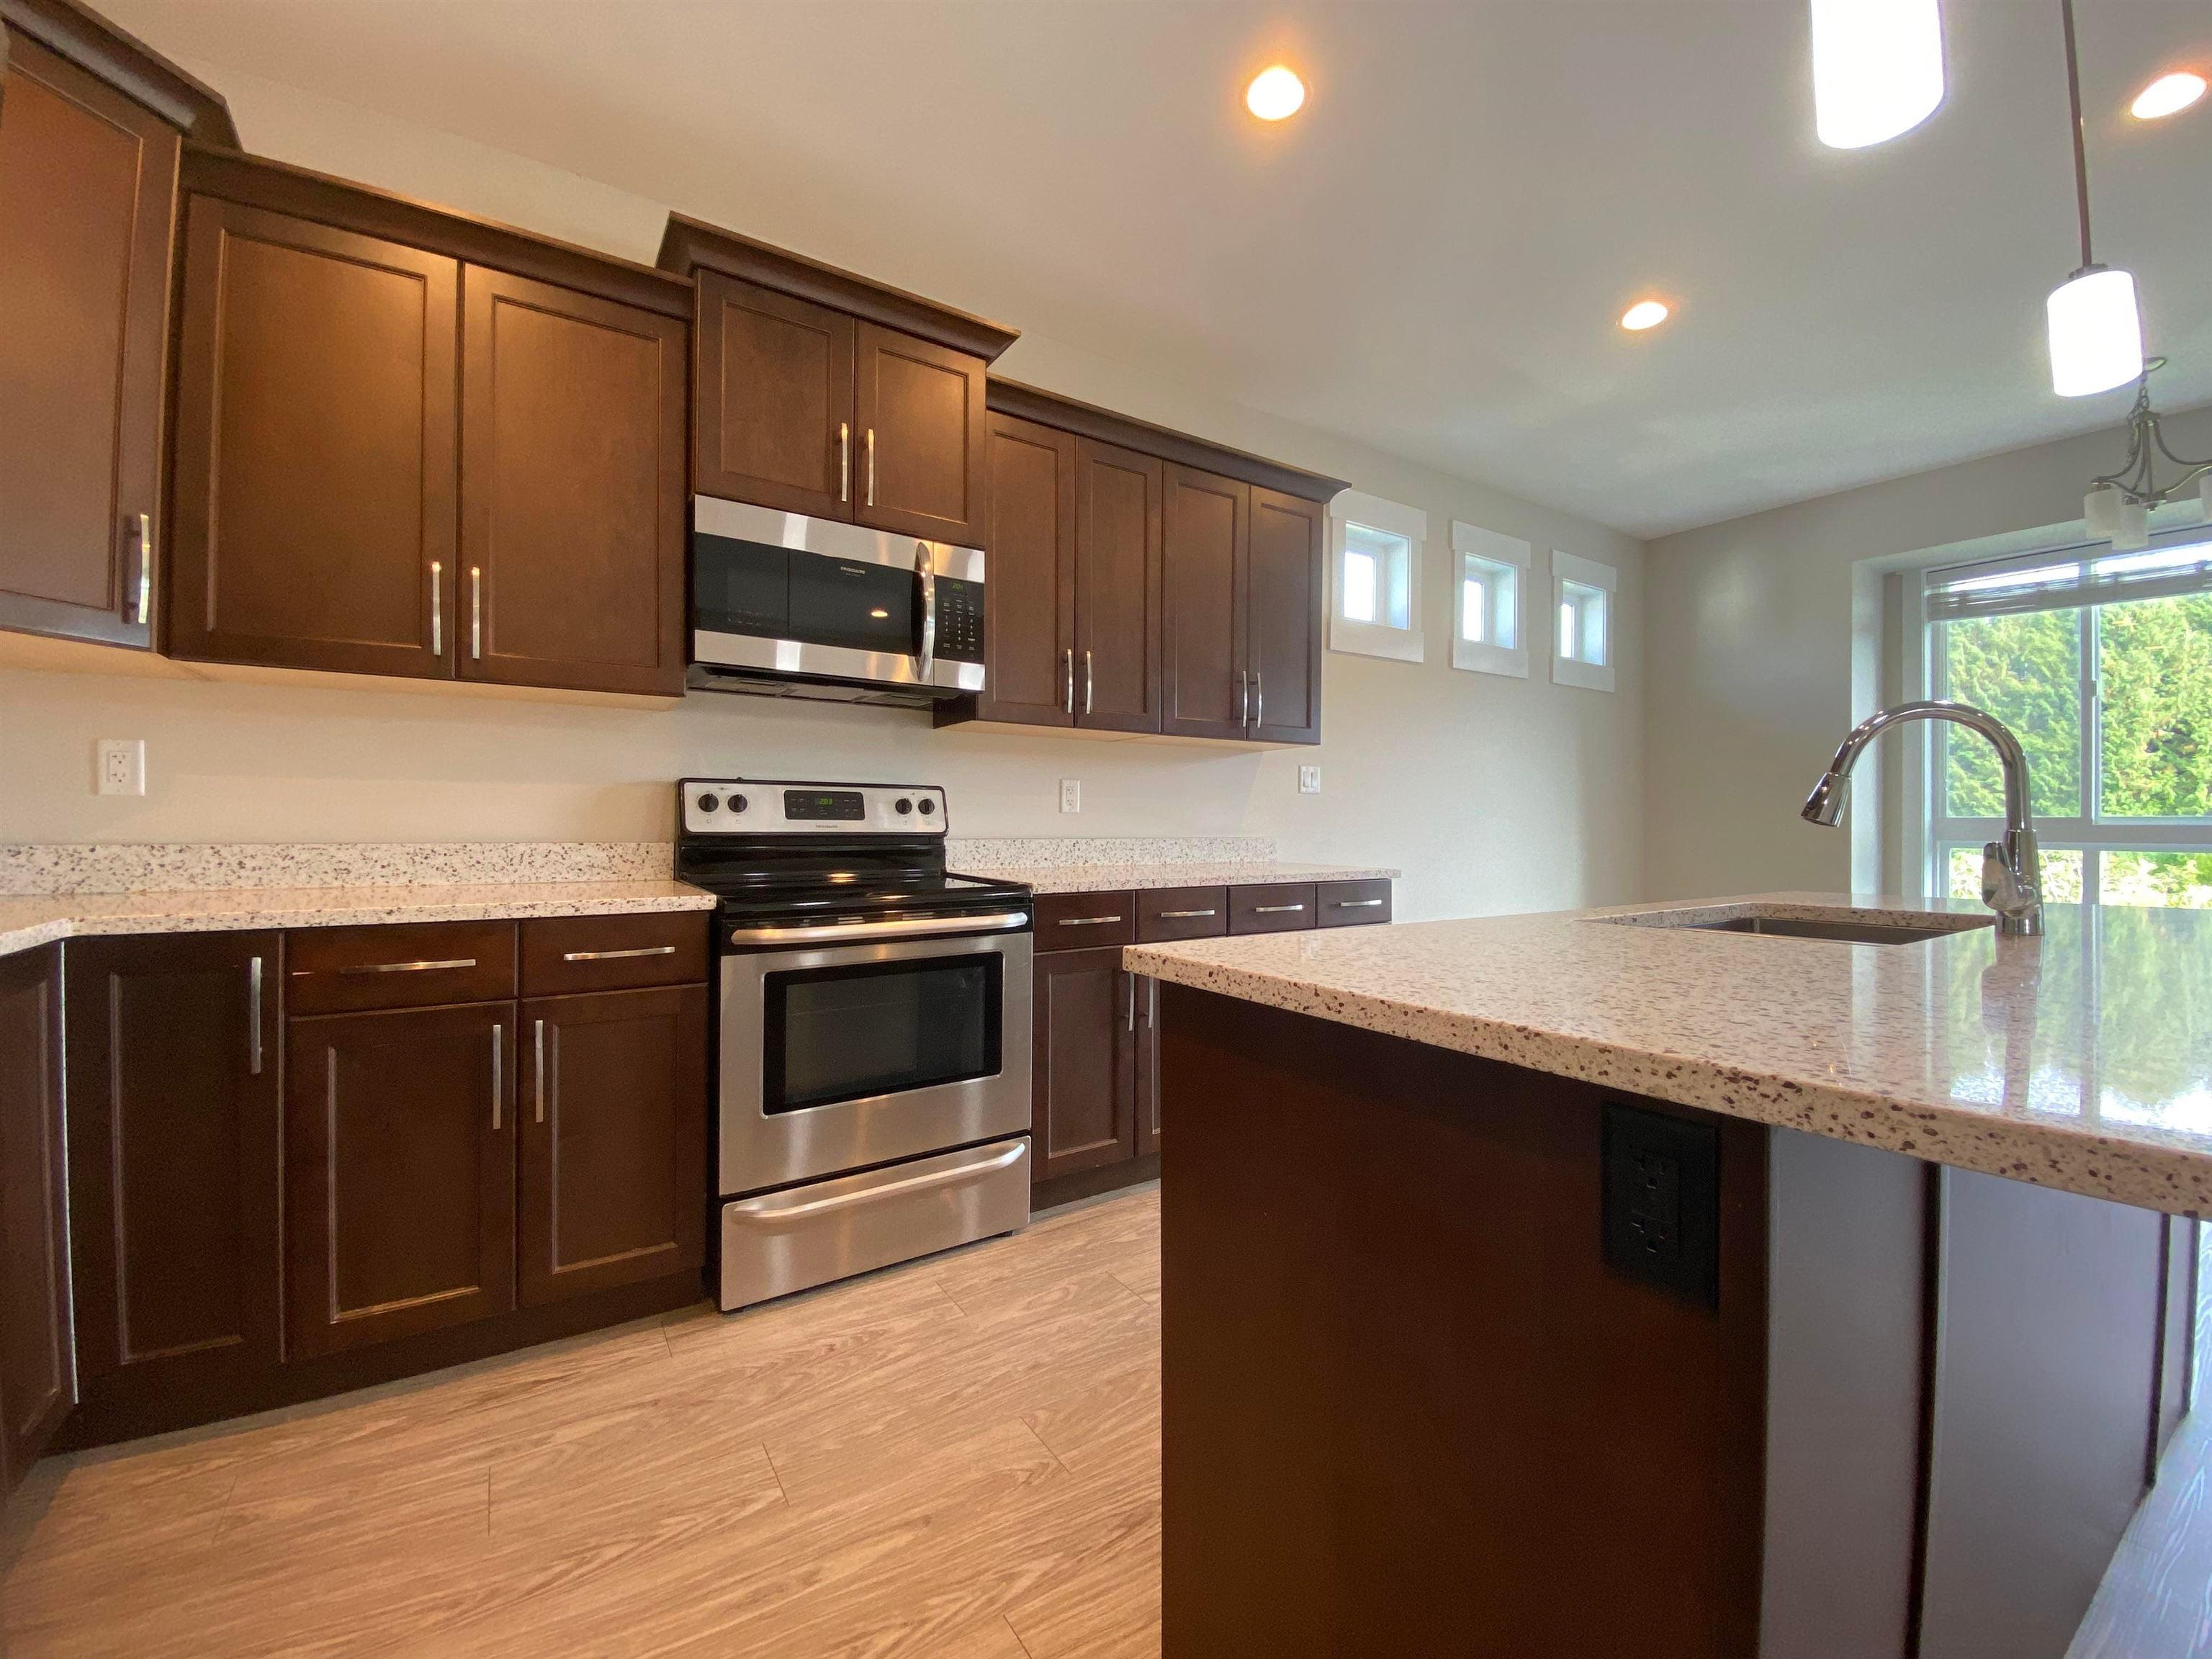 10144 KILLARNEY DRIVE - Fairfield Island House/Single Family for sale, 5 Bedrooms (R2625716) - #16